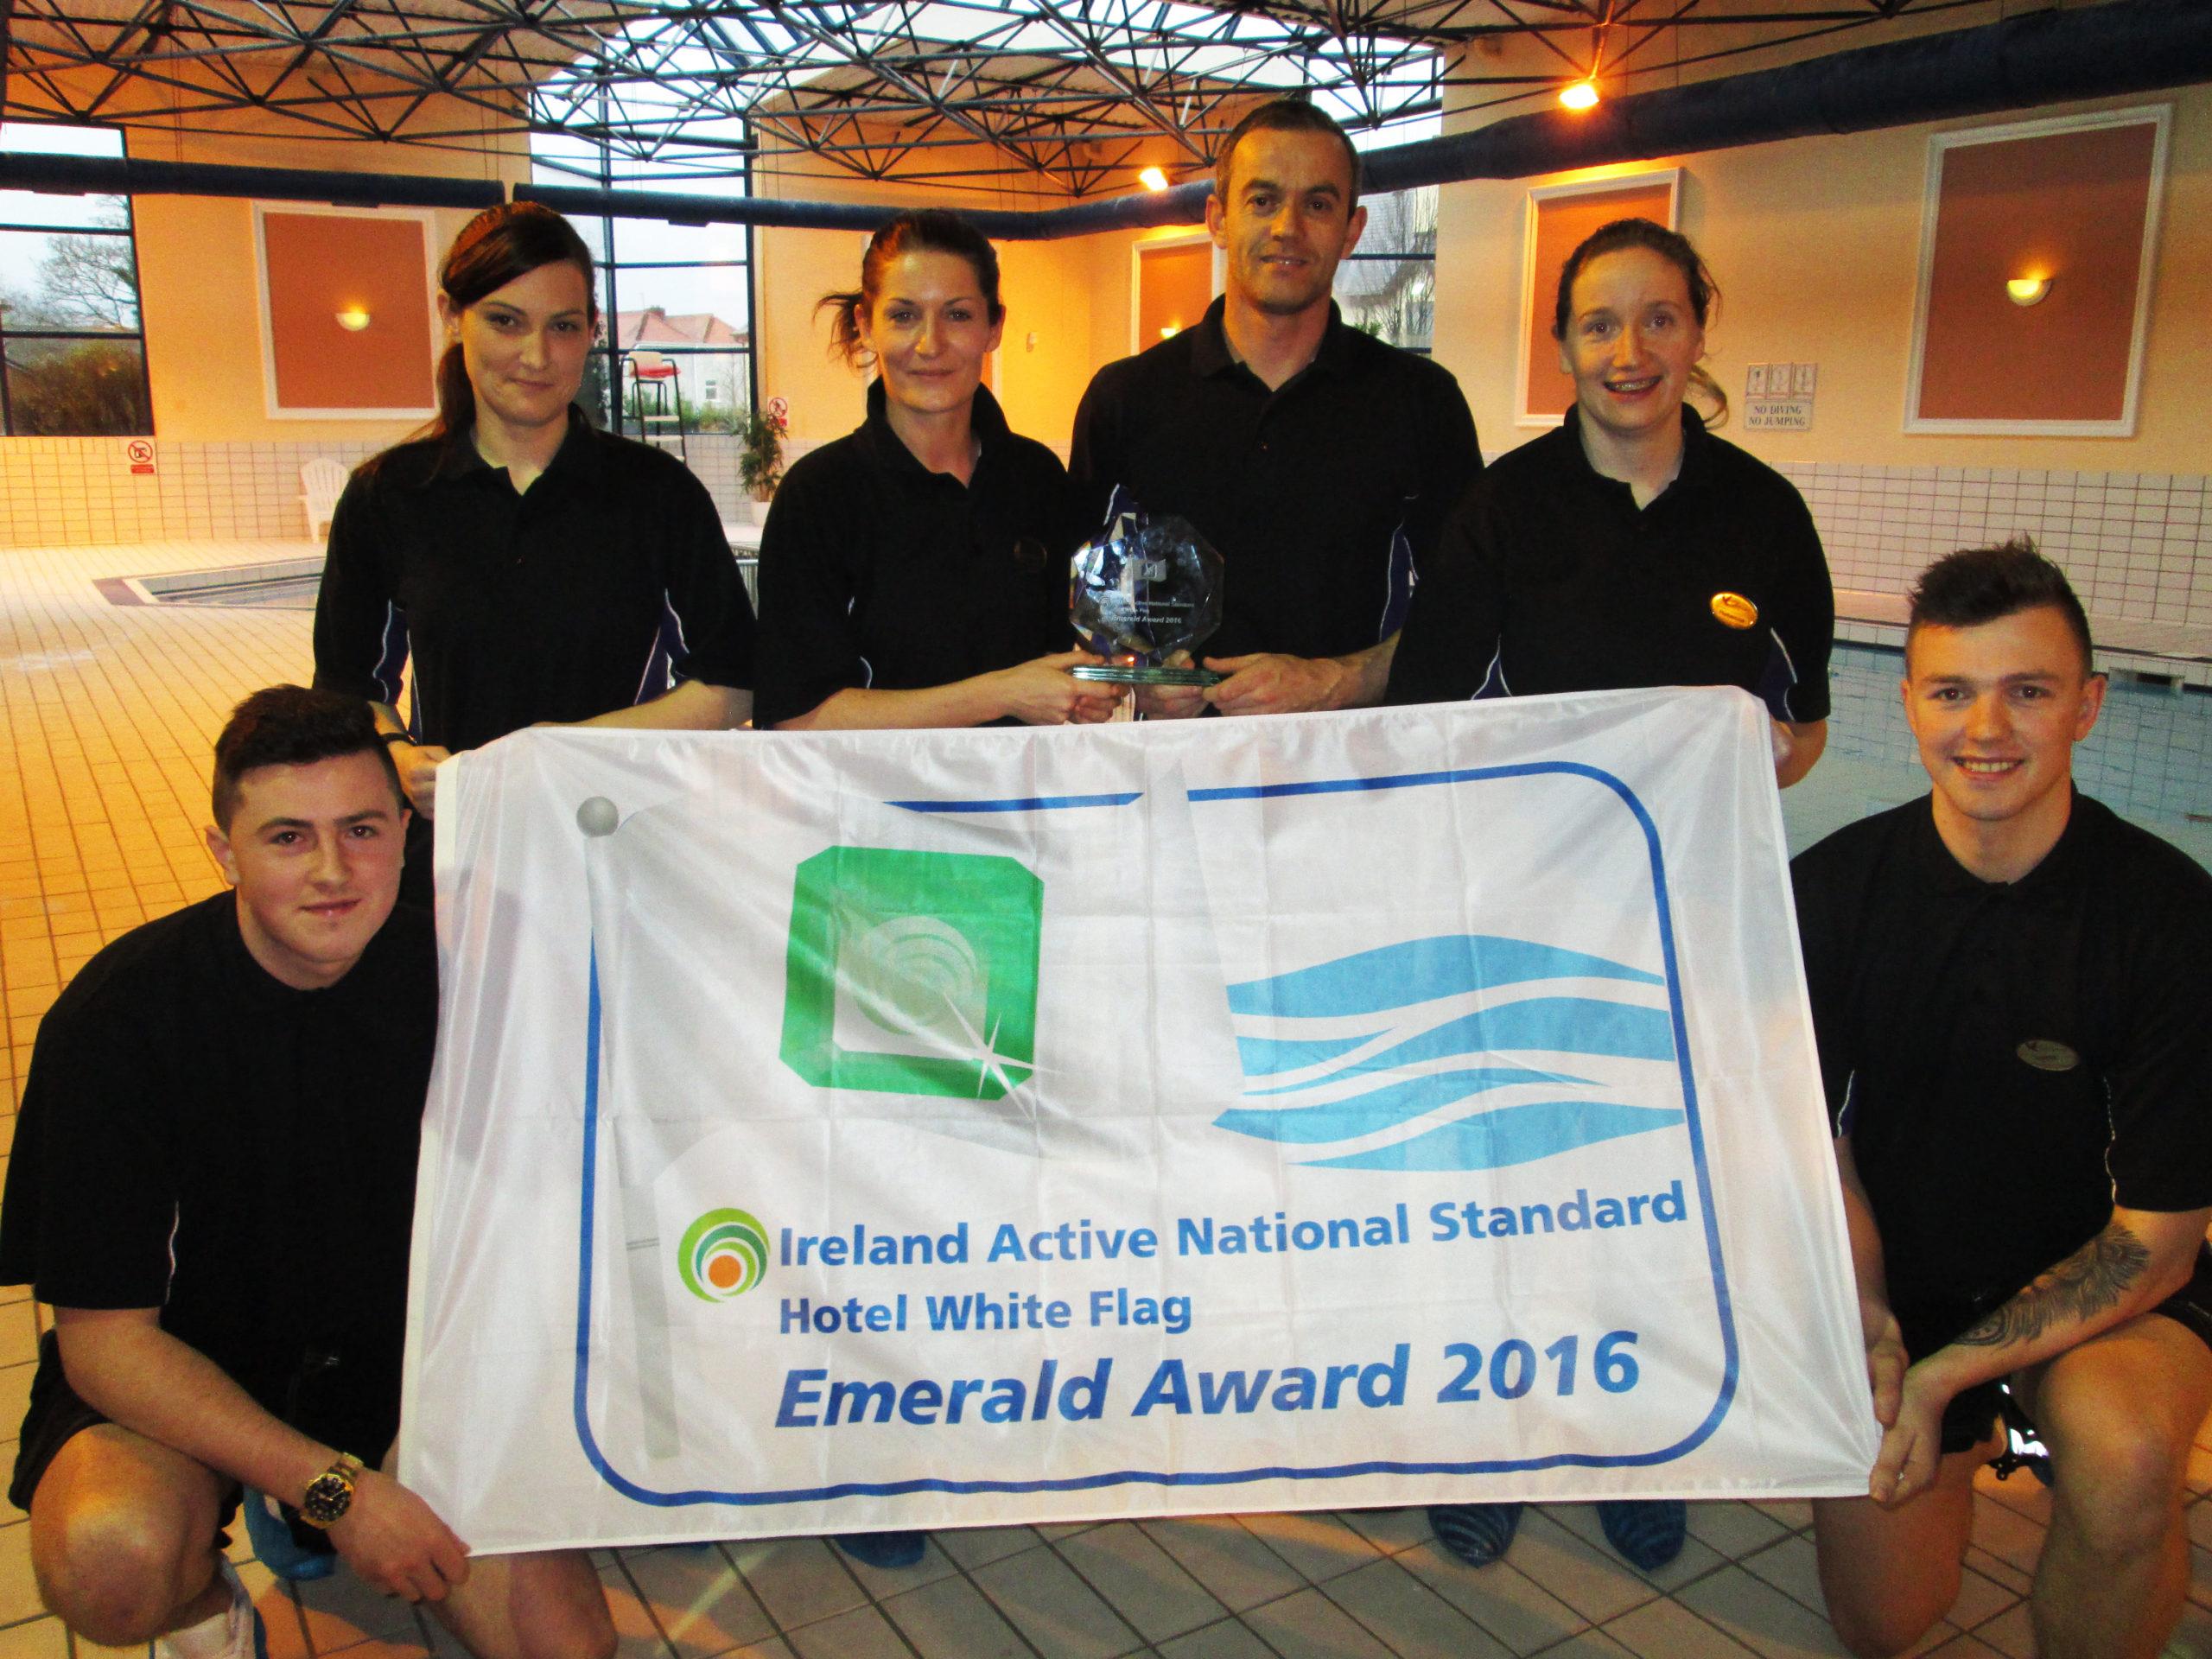 The team at Club Vitae at Hotel Killarney, Brad Gordon, Sharon O'Sullivan, Louise Devaney, Philip O'Brien, Rebecca Nagle and Gordon Buckley.